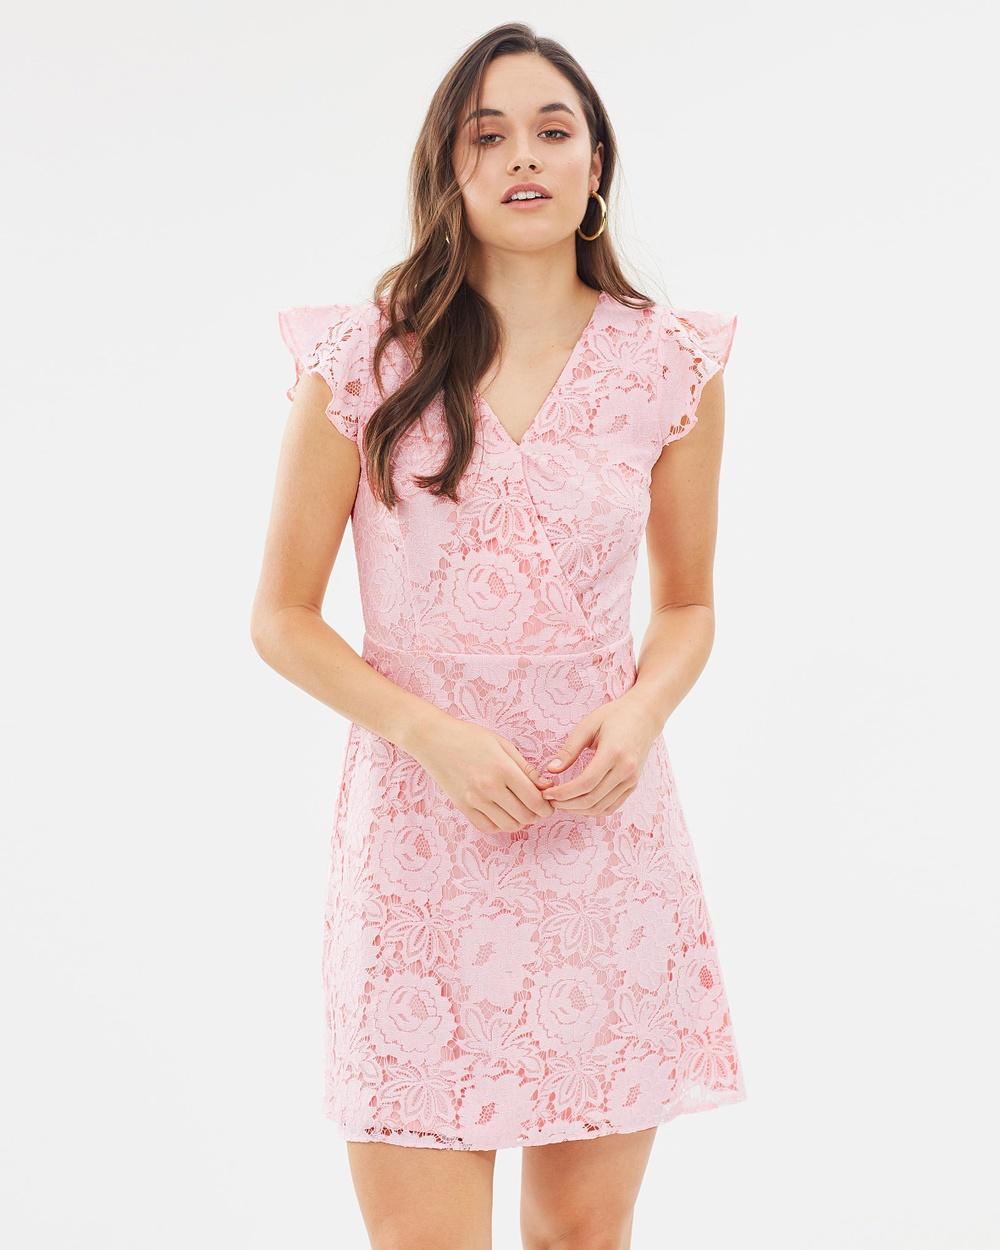 Dorothy Perkins Floral Lace Wrap Dress Dresses Blush Floral Lace Wrap Dress